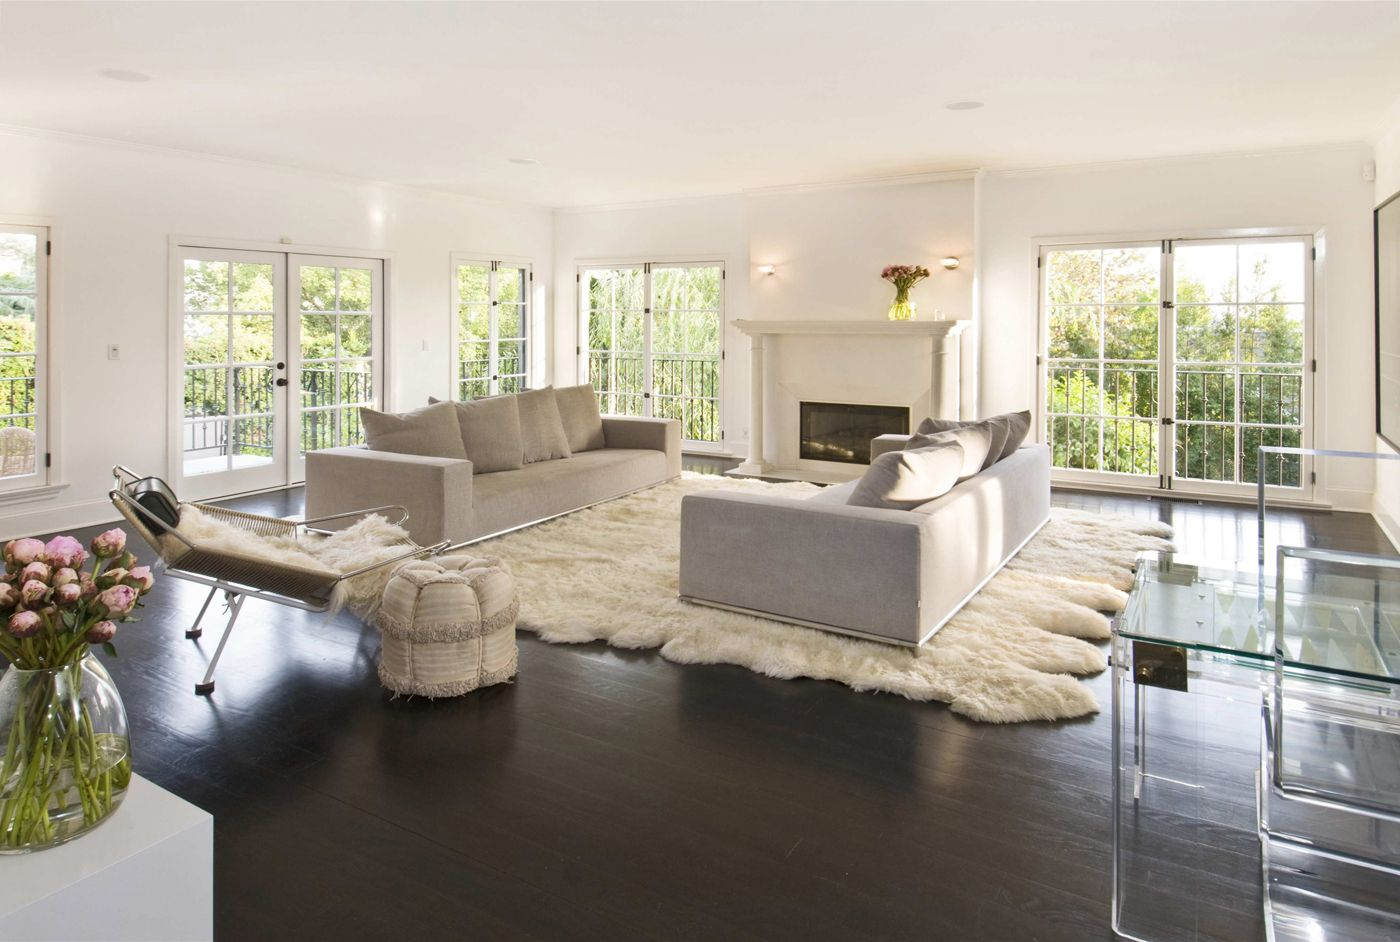 Katy Perry Living Room Home Inside Celebrity Homes Celebrity